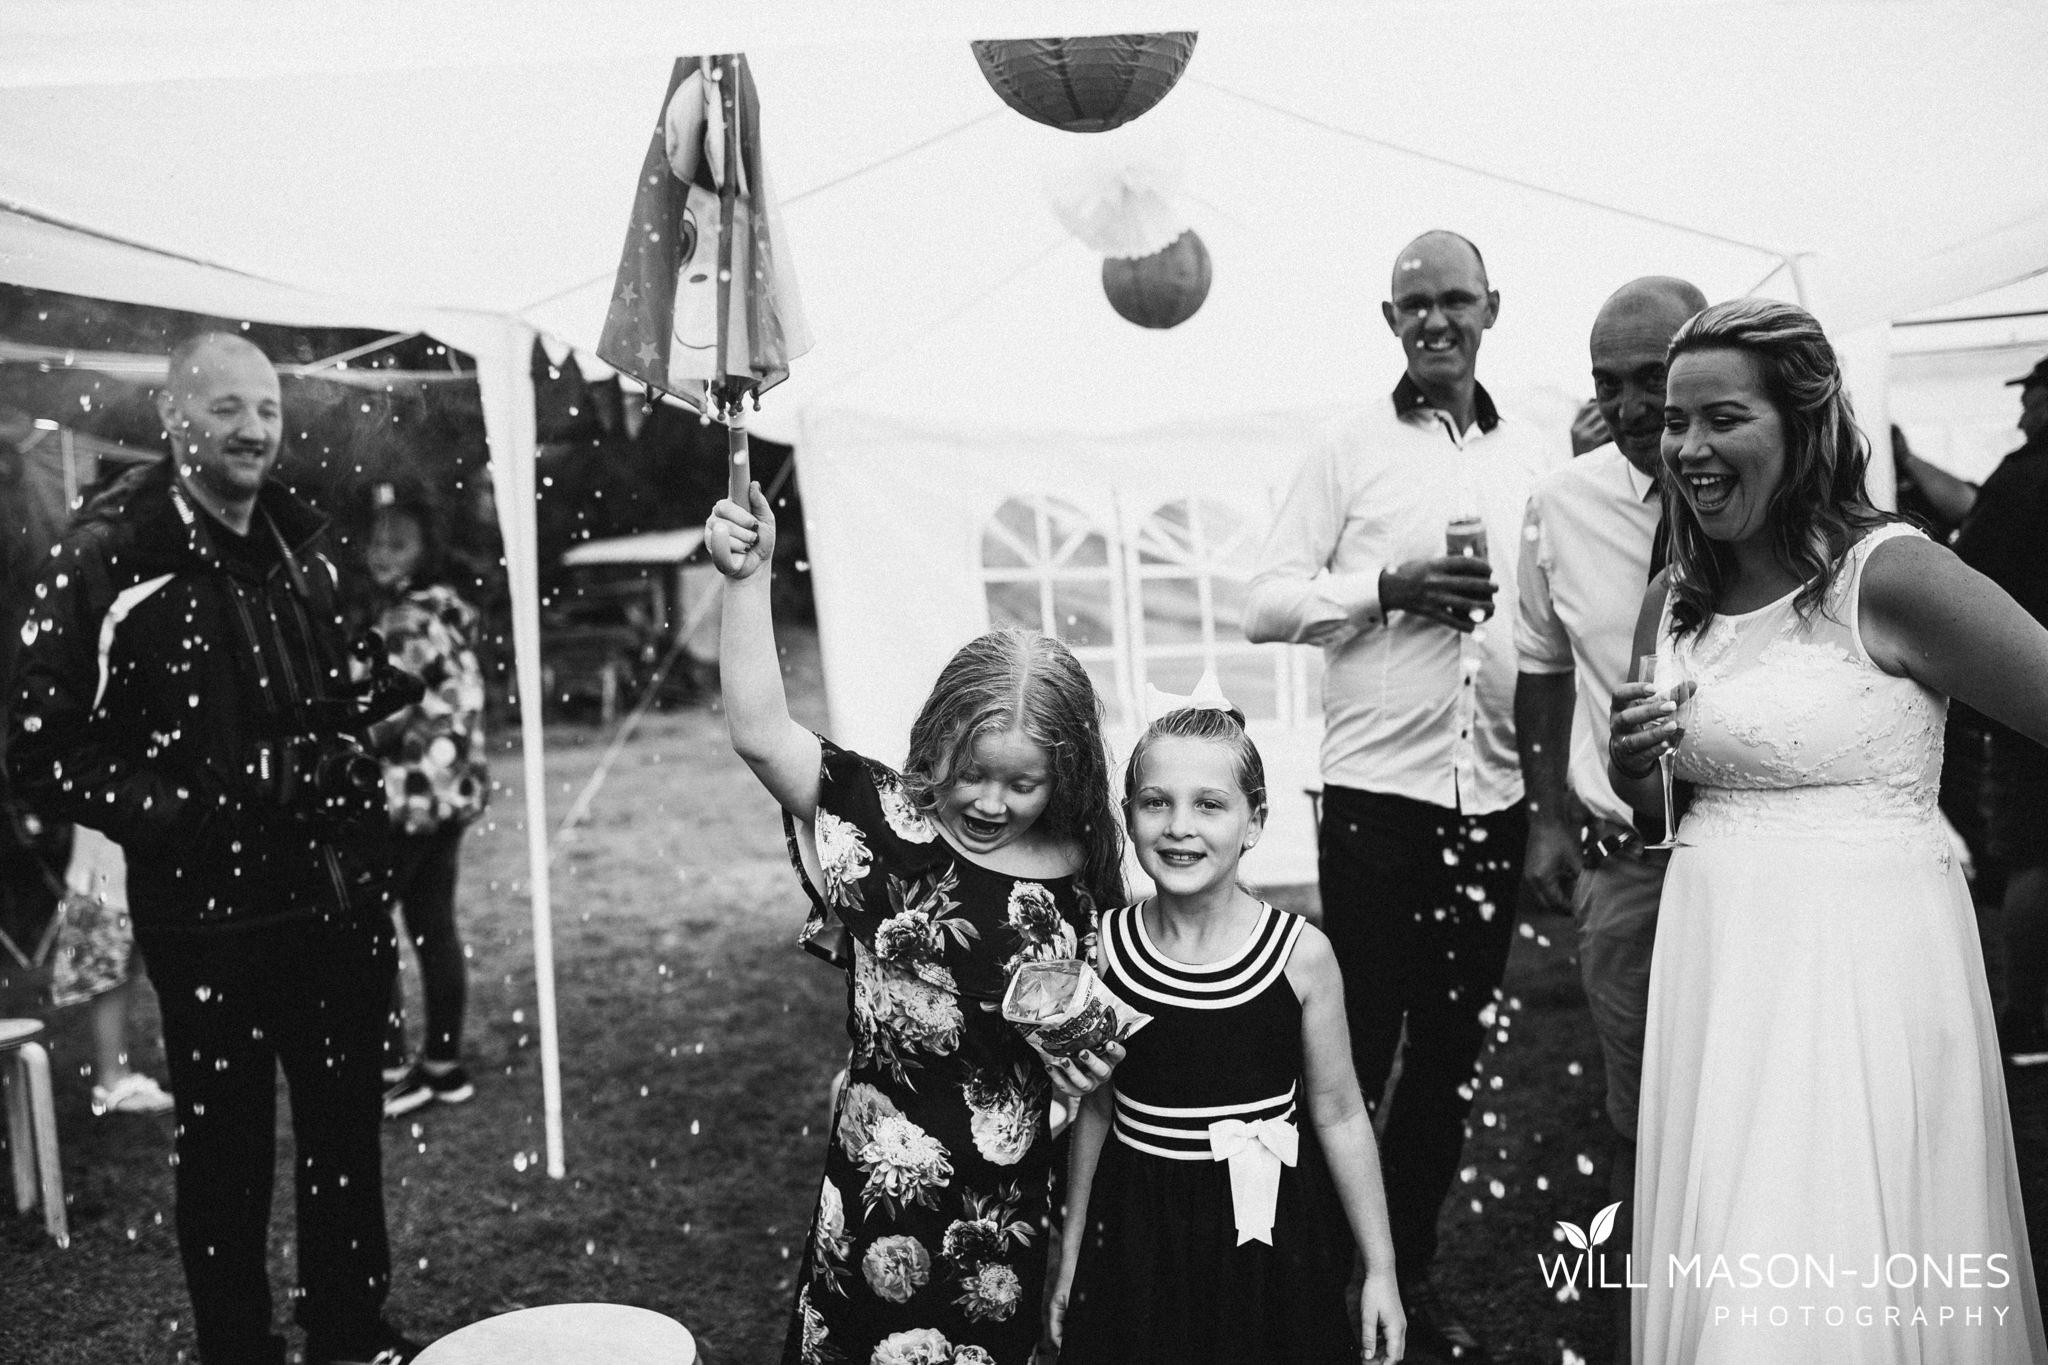 outdoor-wet-rainy-wedding-uk-swansea-photography-24.jpg